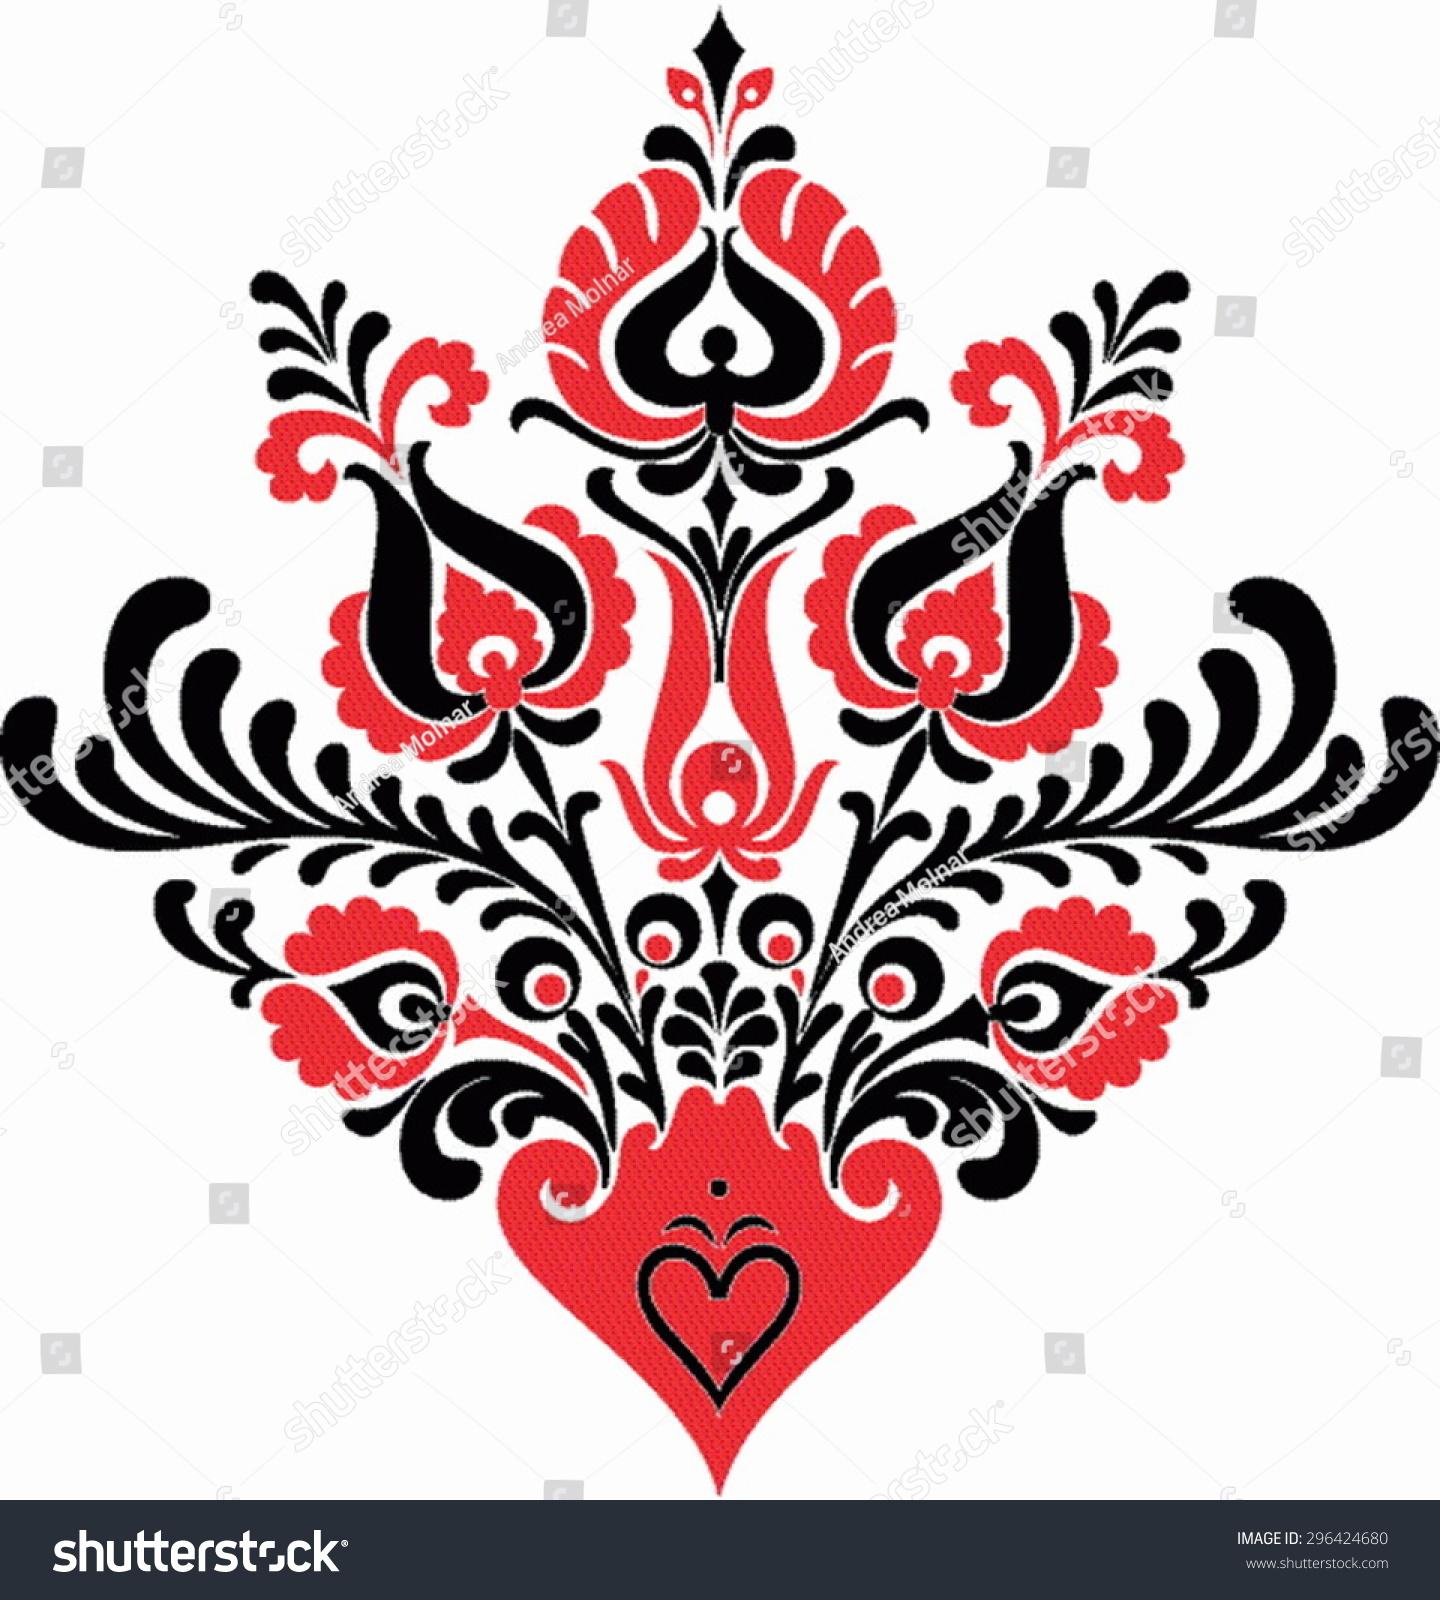 Beautiful Hungarian Folk Art Motif Stock Vector Illustration 296424680 Shutterstock